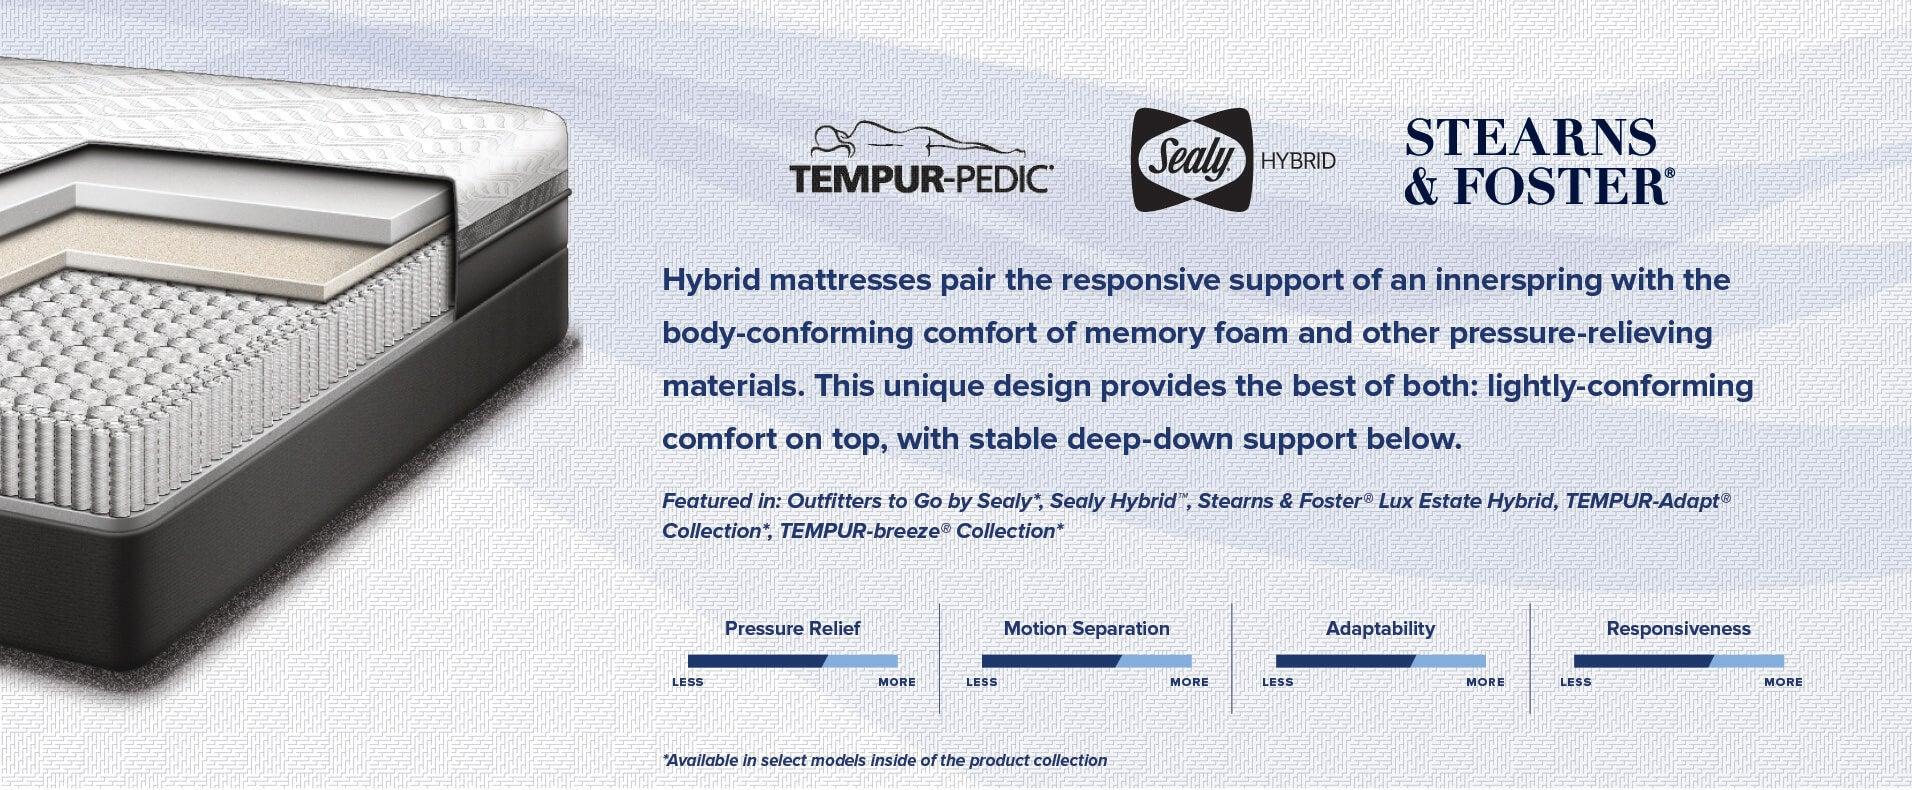 Sleep Smarter - Hybrid